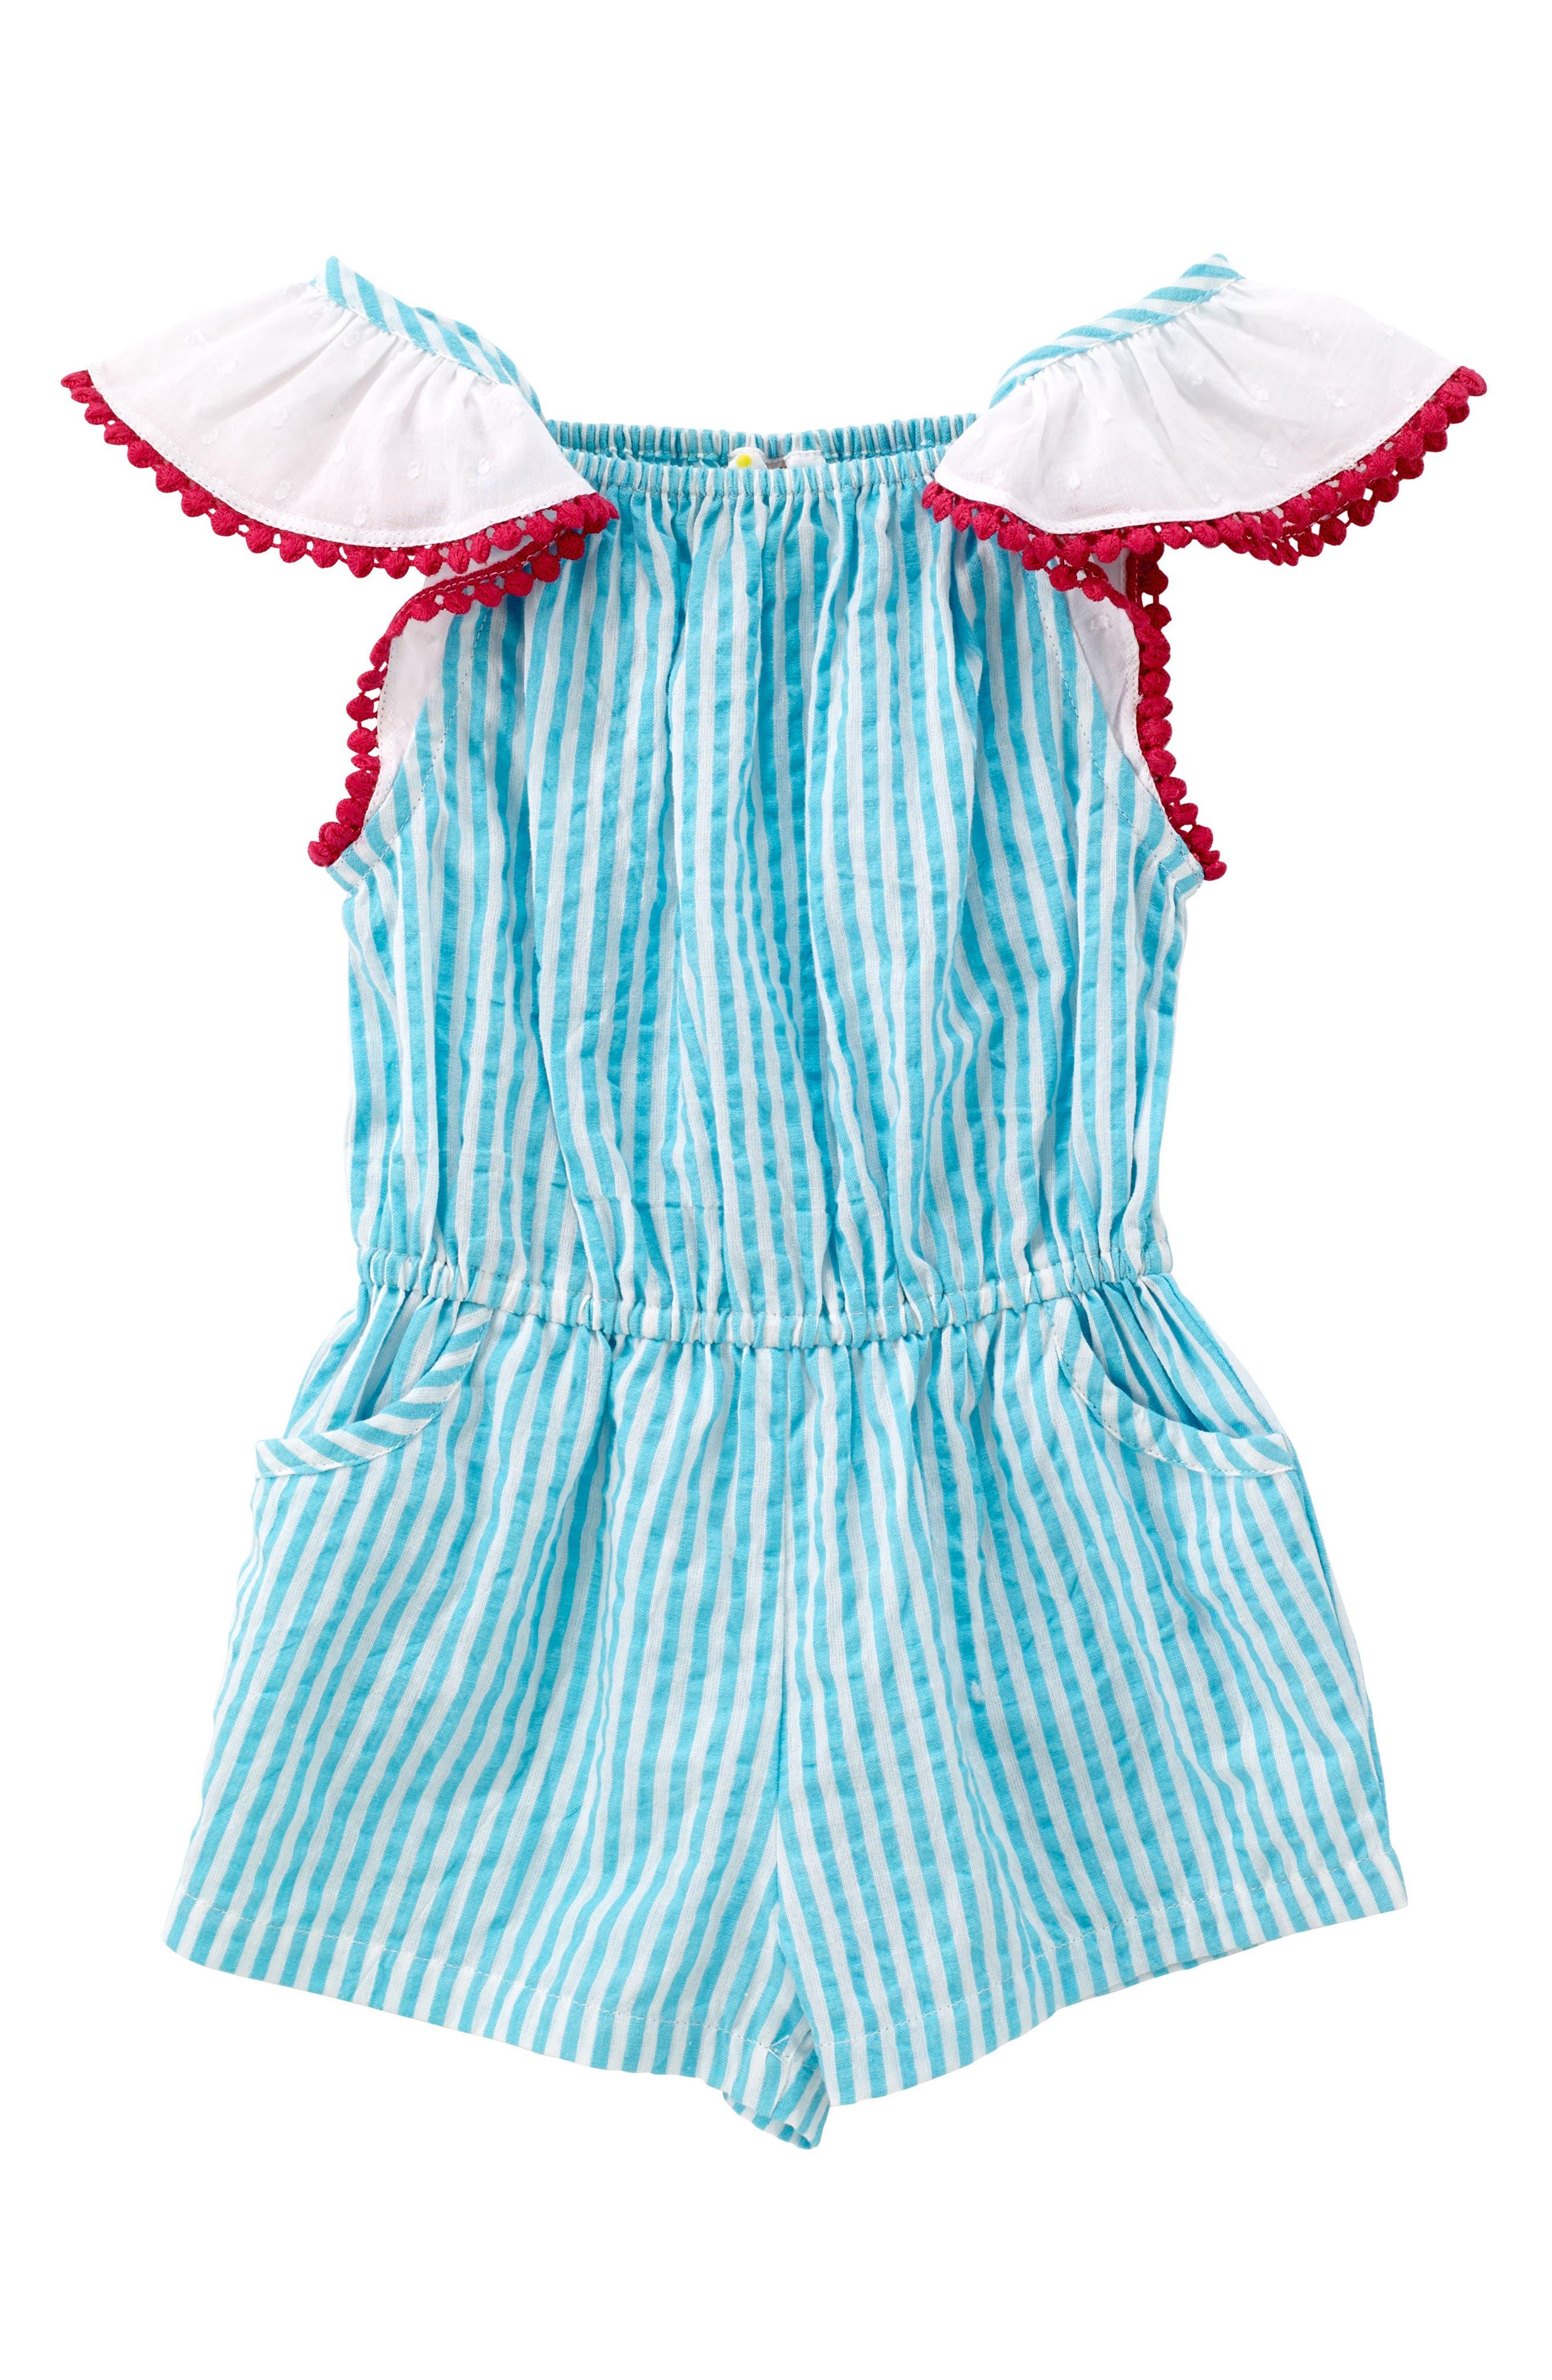 Main Image - Masalababy Zuri Stripe Romper (Toddler Girls)